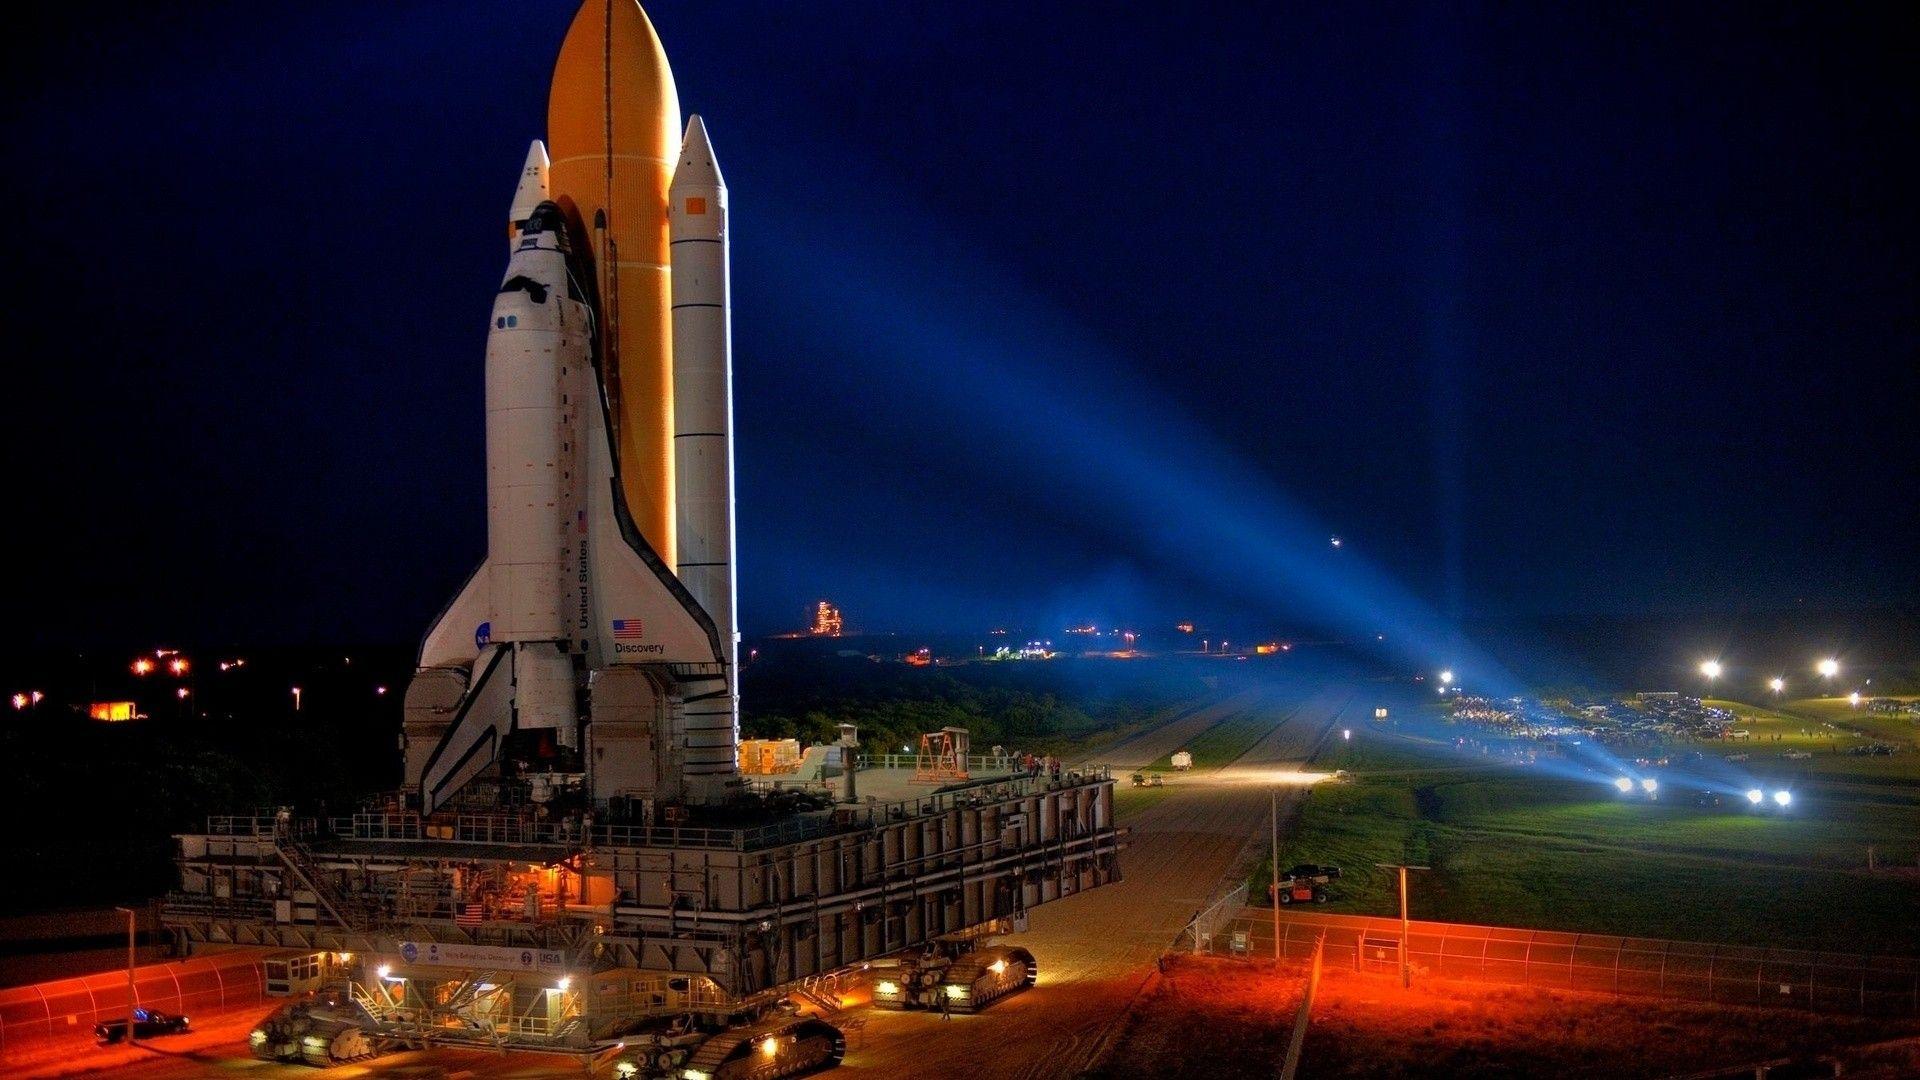 How NASA Prepare Their Astronauts by Using Vacuum Chambers